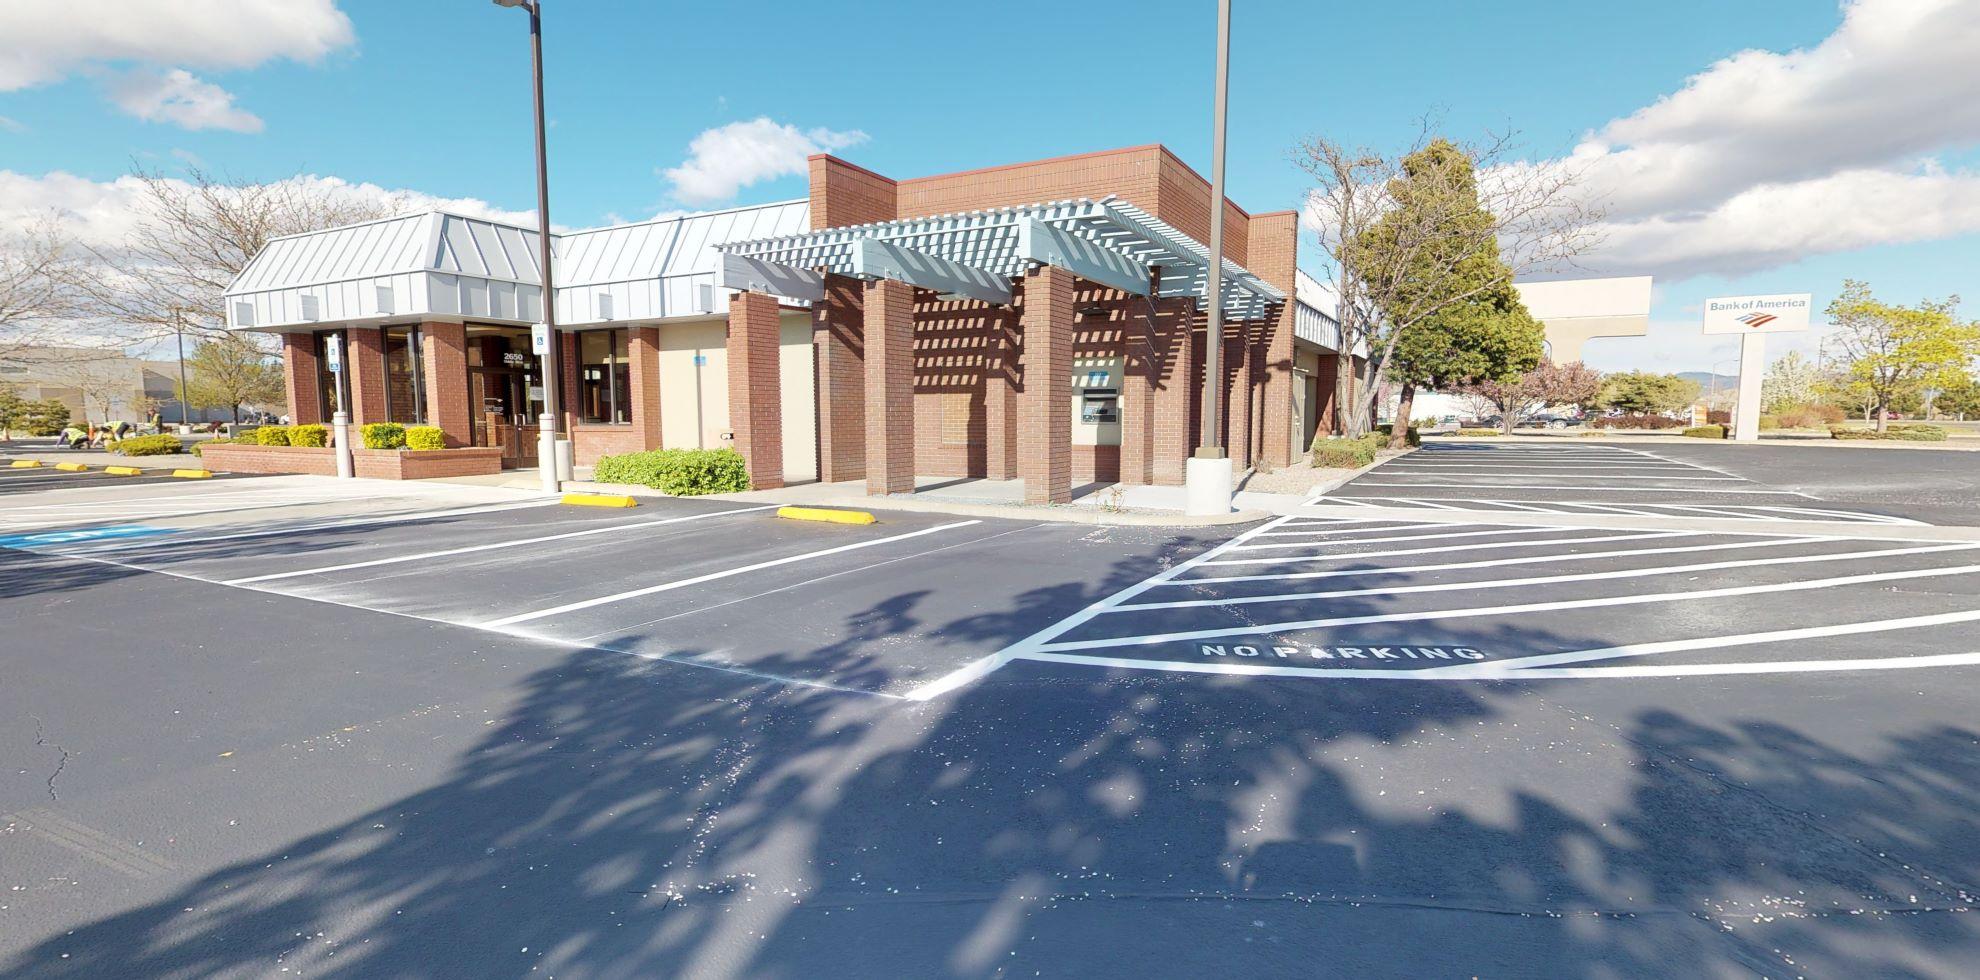 Bank of America financial center with drive-thru ATM | 2650 Oddie Blvd, Sparks, NV 89431